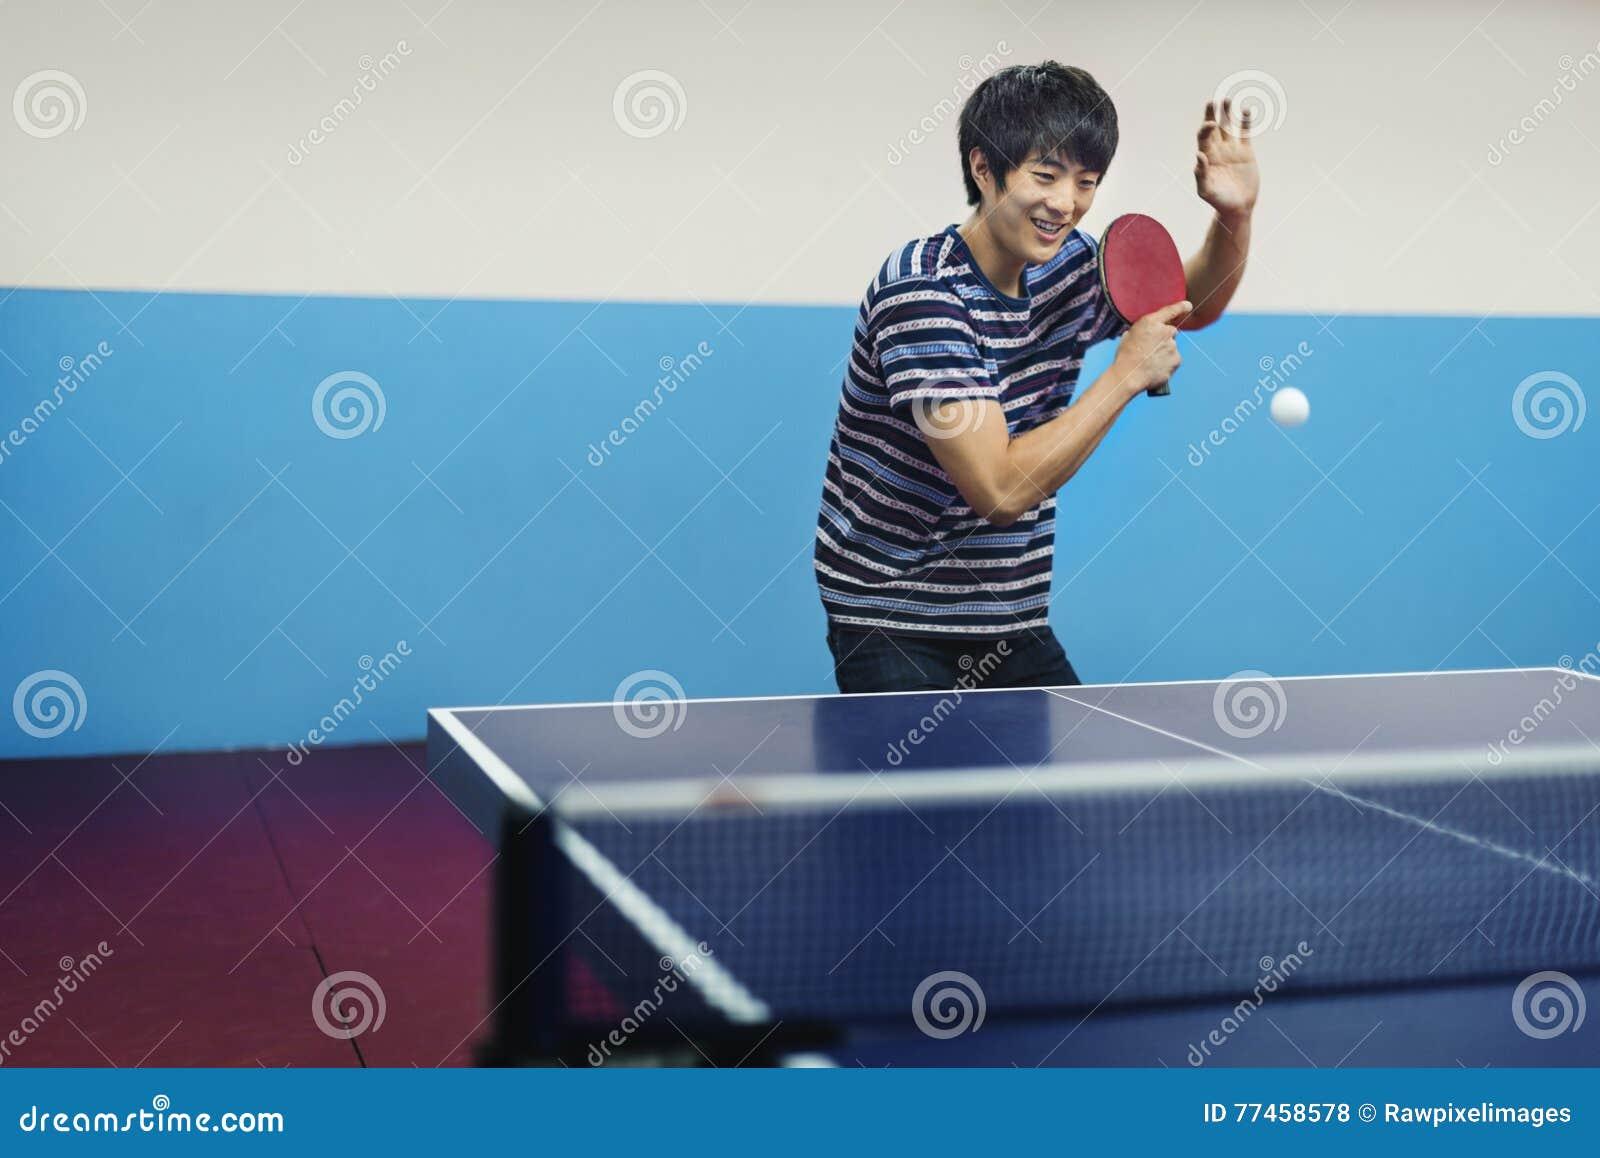 Atleta Ping-Pong Sportman Sport Concept do tênis de mesa